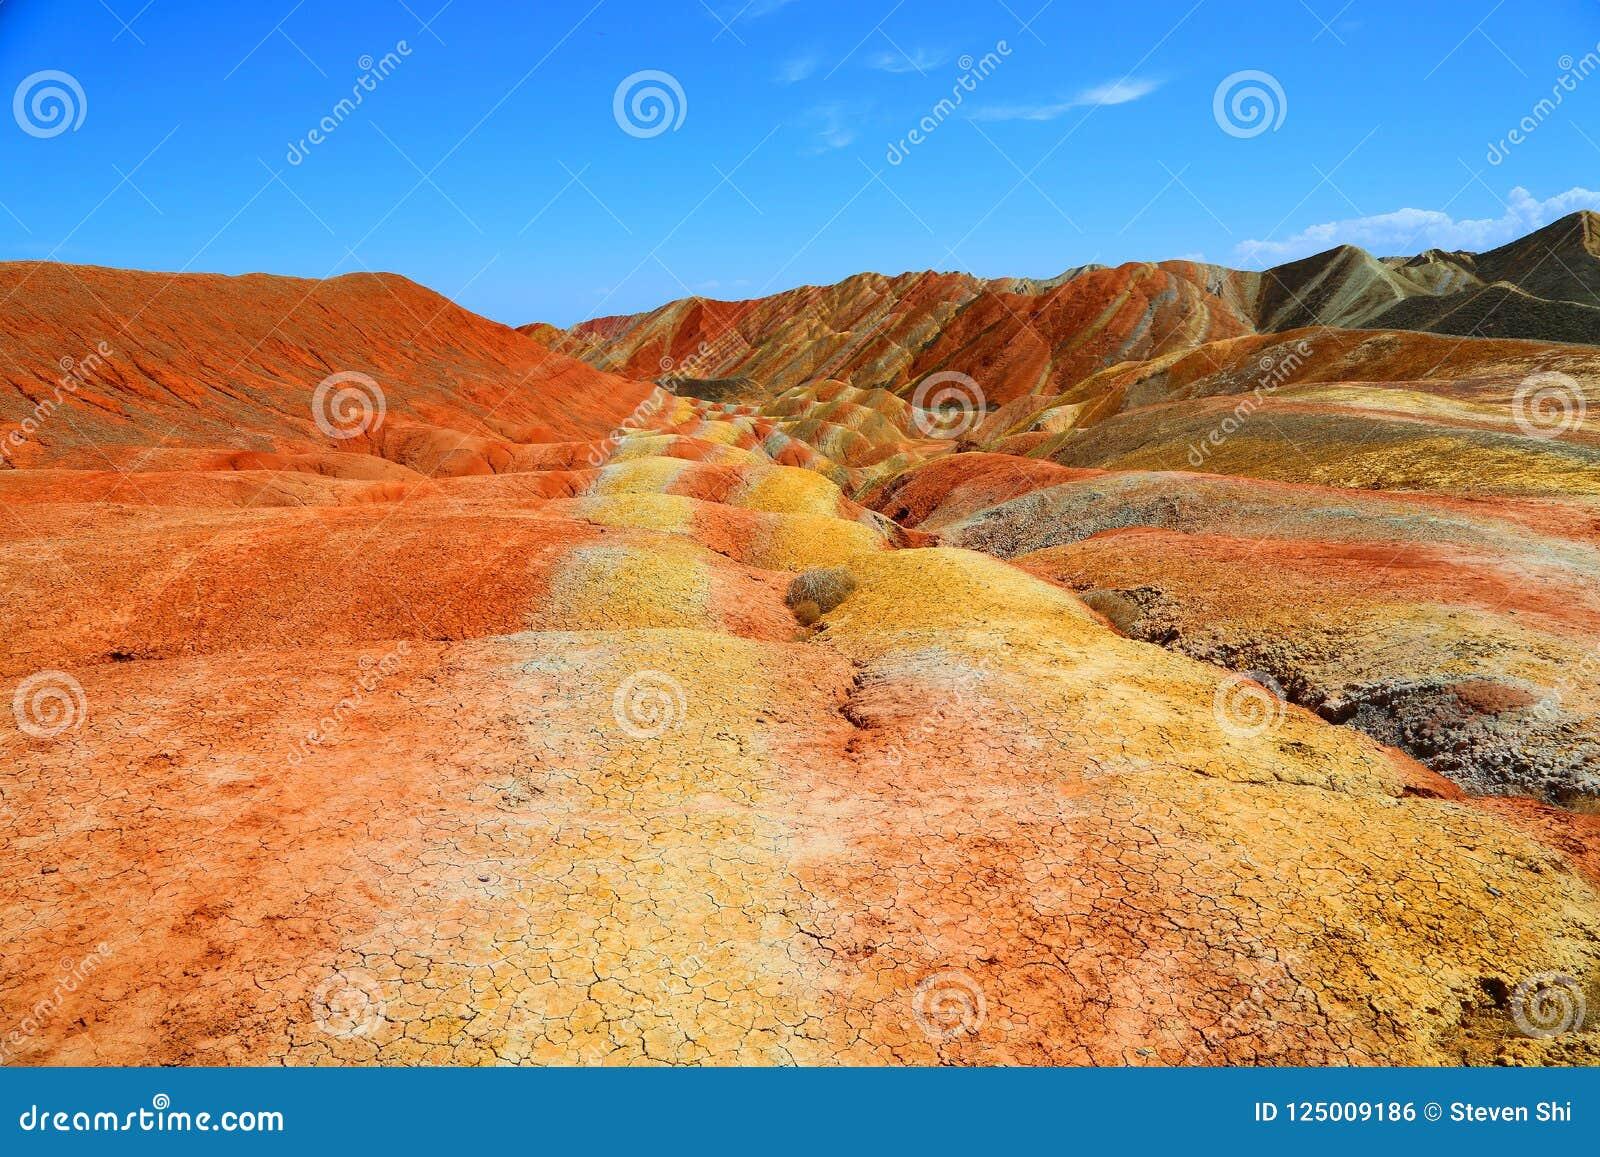 Danxia Geological park, Zhangye, Gansu prowincja, Chiny